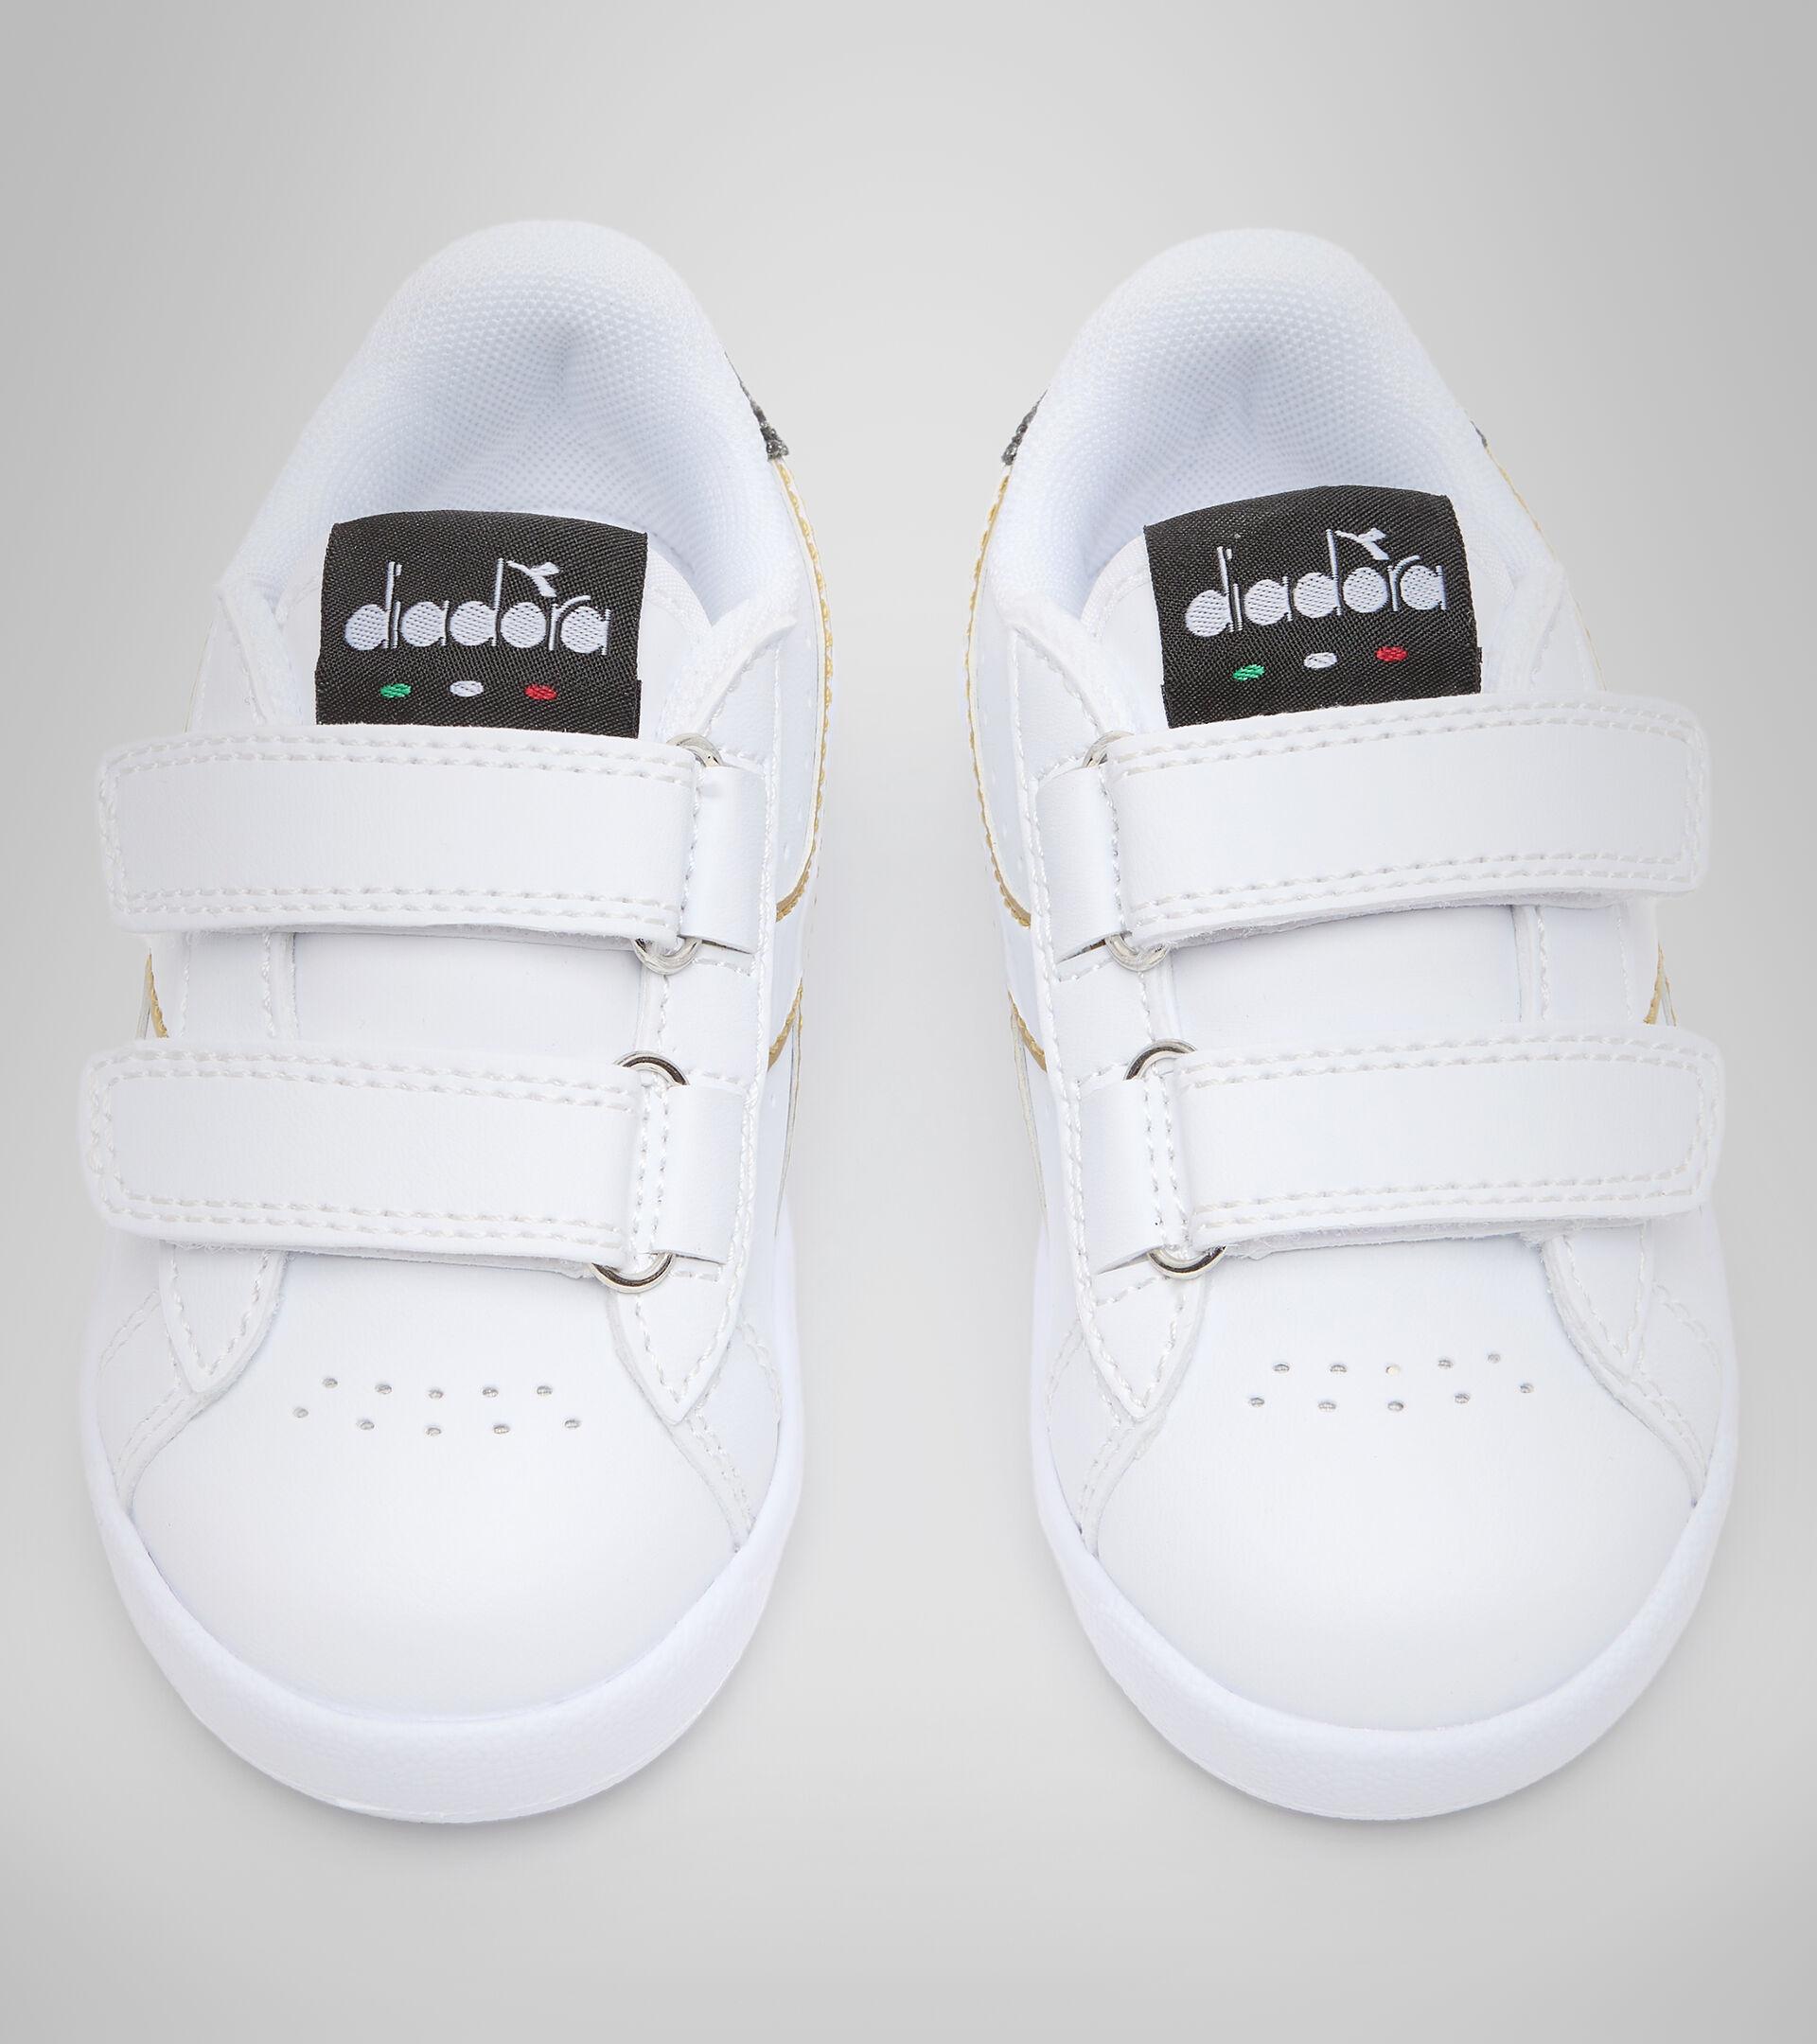 Footwear Sport BAMBINO GAME P TD GIRL BIANCO/NERO/ORO Diadora